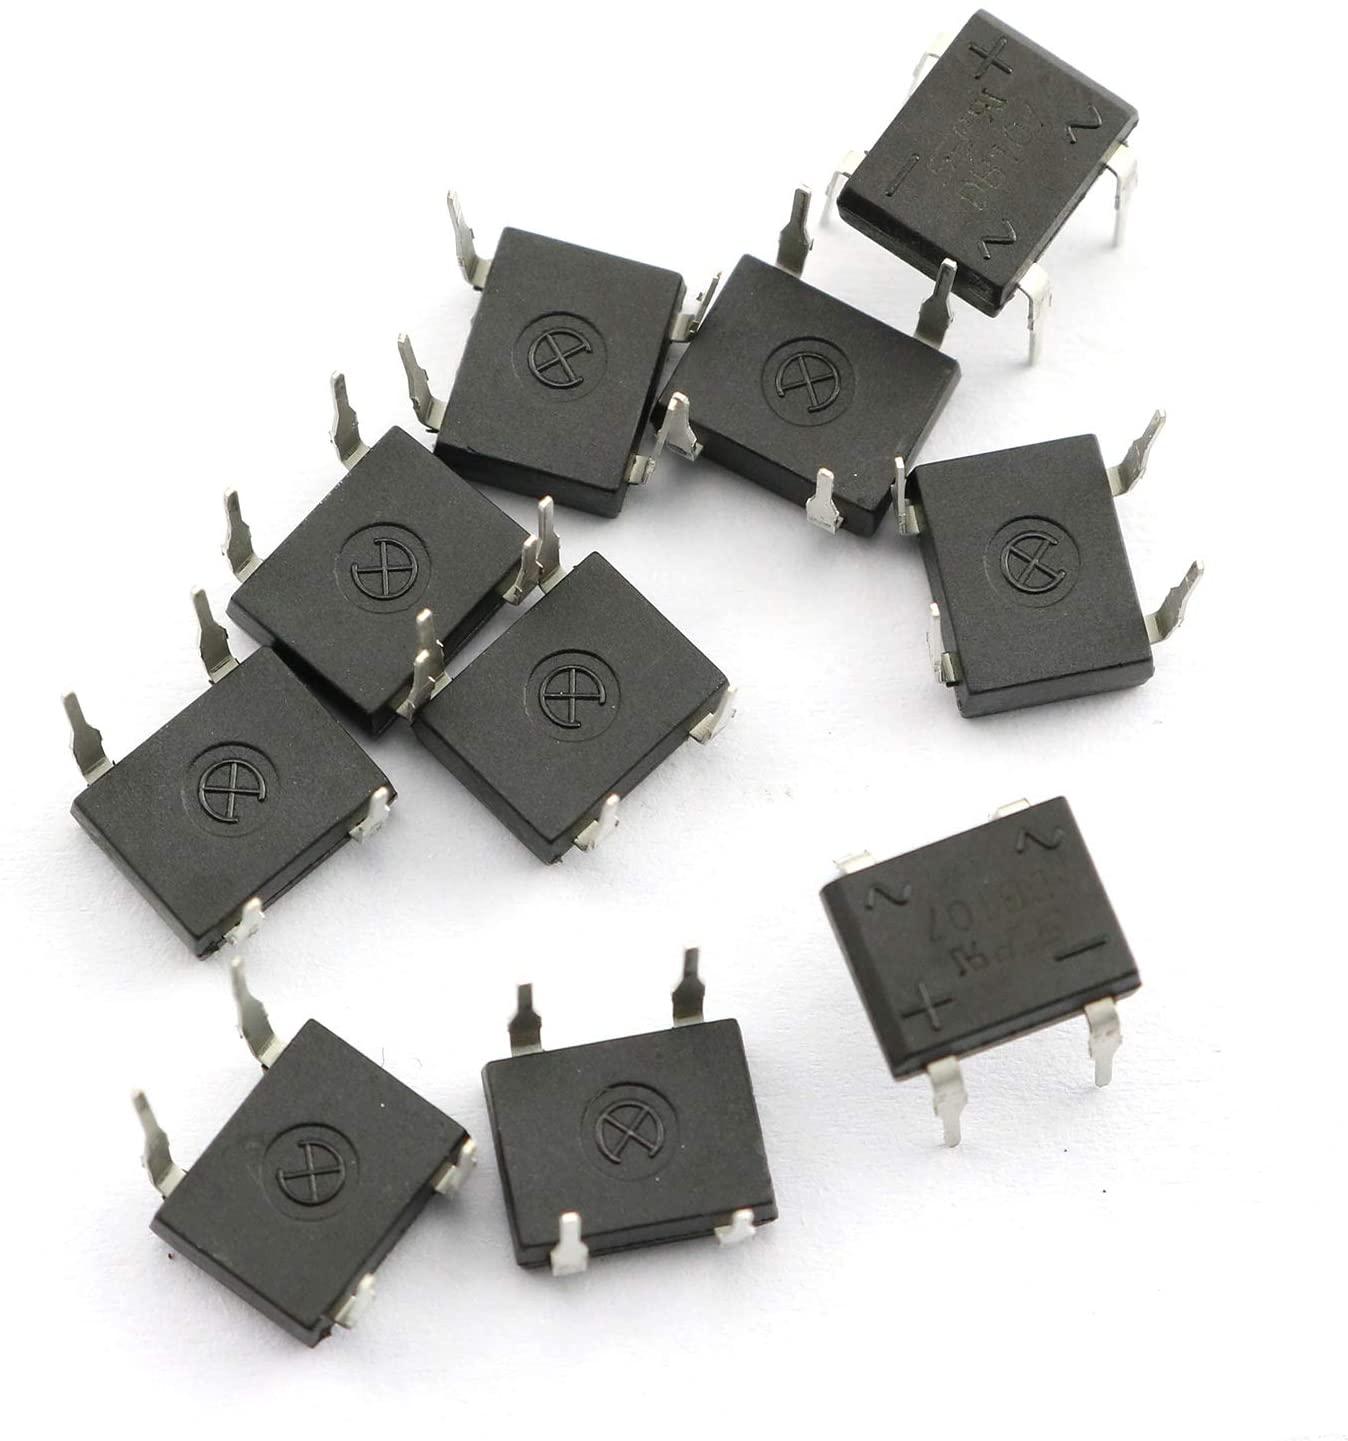 Tegg DB107 Bridge Rectifier 10PCS Electronic Silicon Diodes 1A 1000V 4-Pin Single Phase Diode Rectifier Bridge